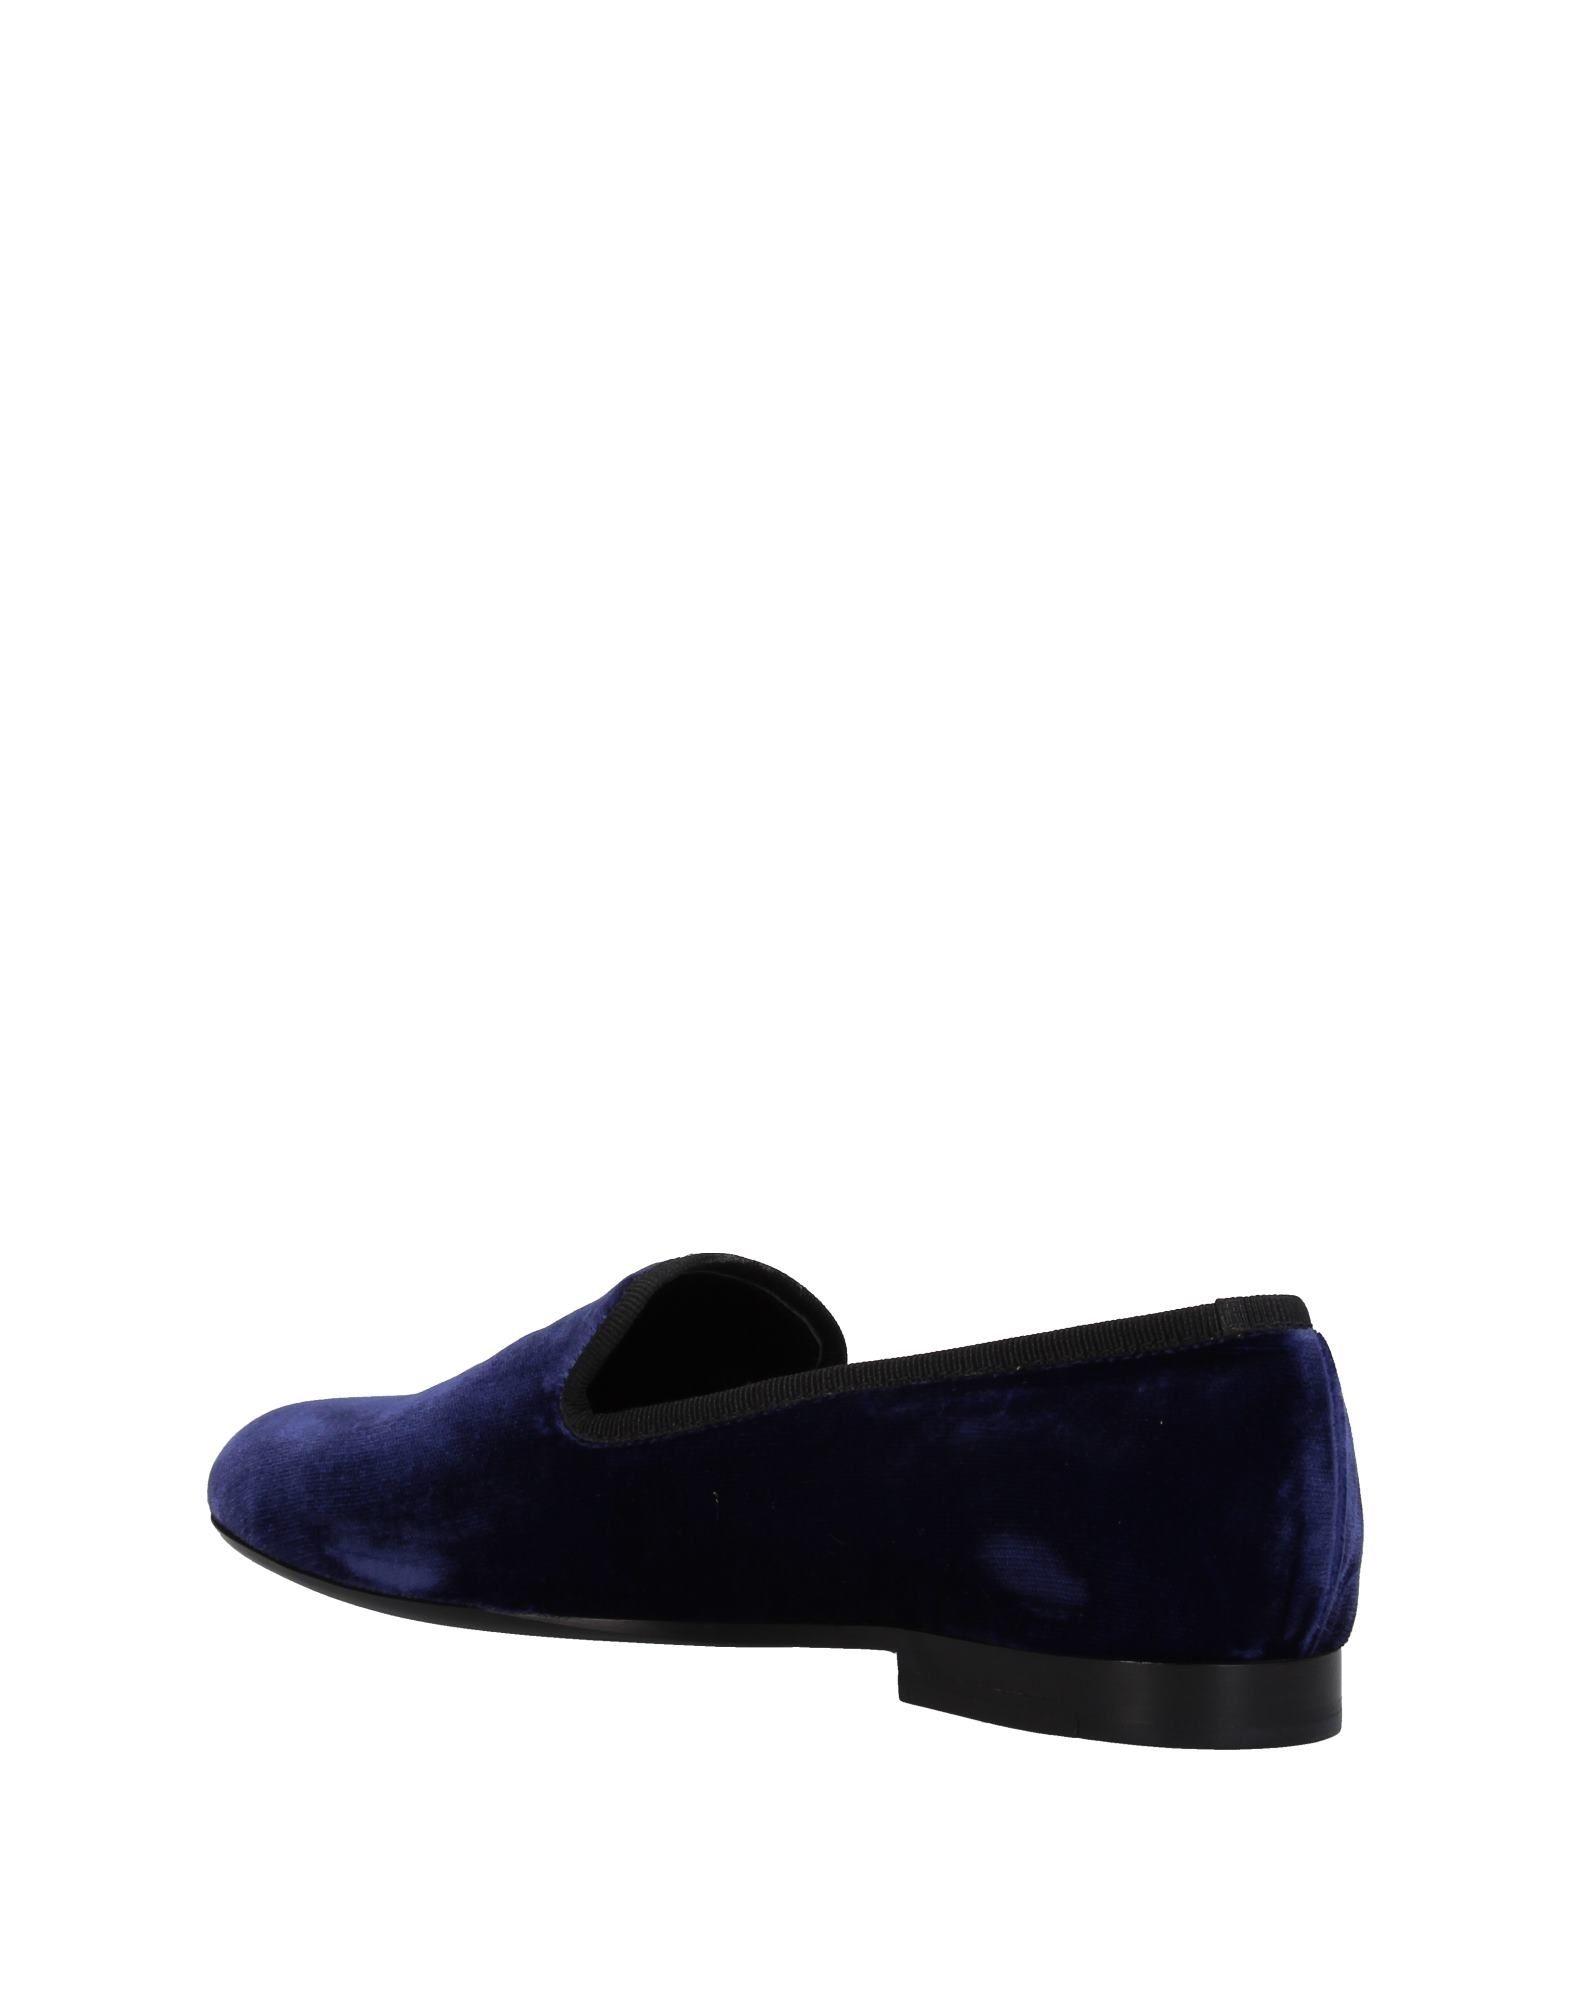 Jacques Morgan Morgan Jacques Mokassins Damen  11372297BO Gute Qualität beliebte Schuhe cd8d12